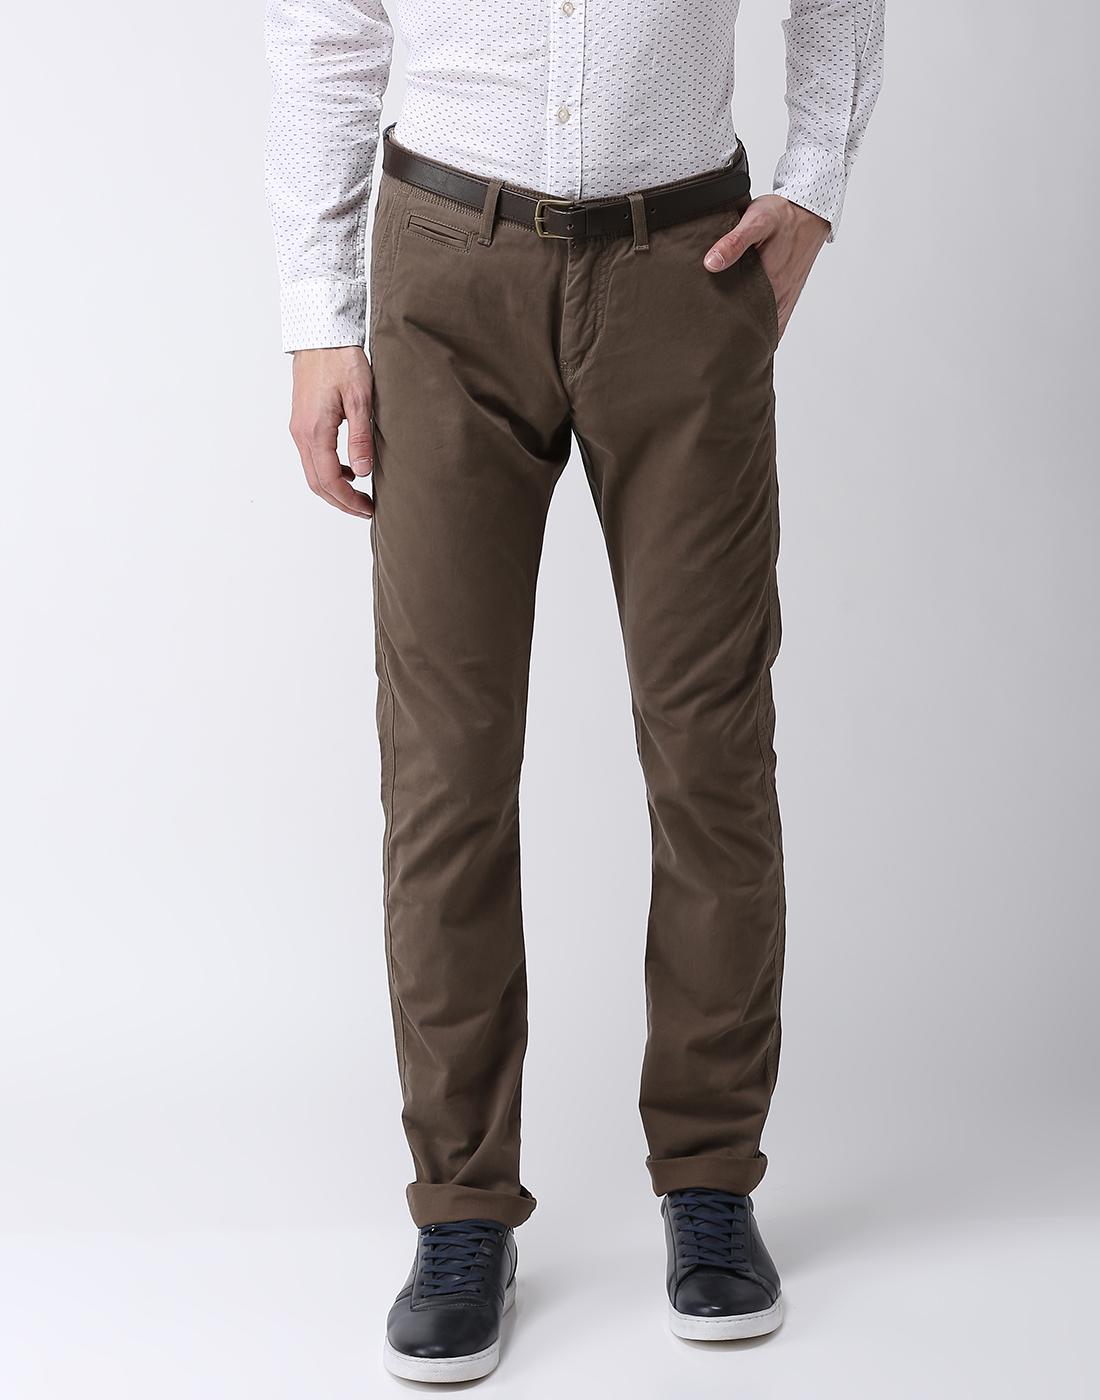 celio   Straight Fit Cotton Blend Green Trouser